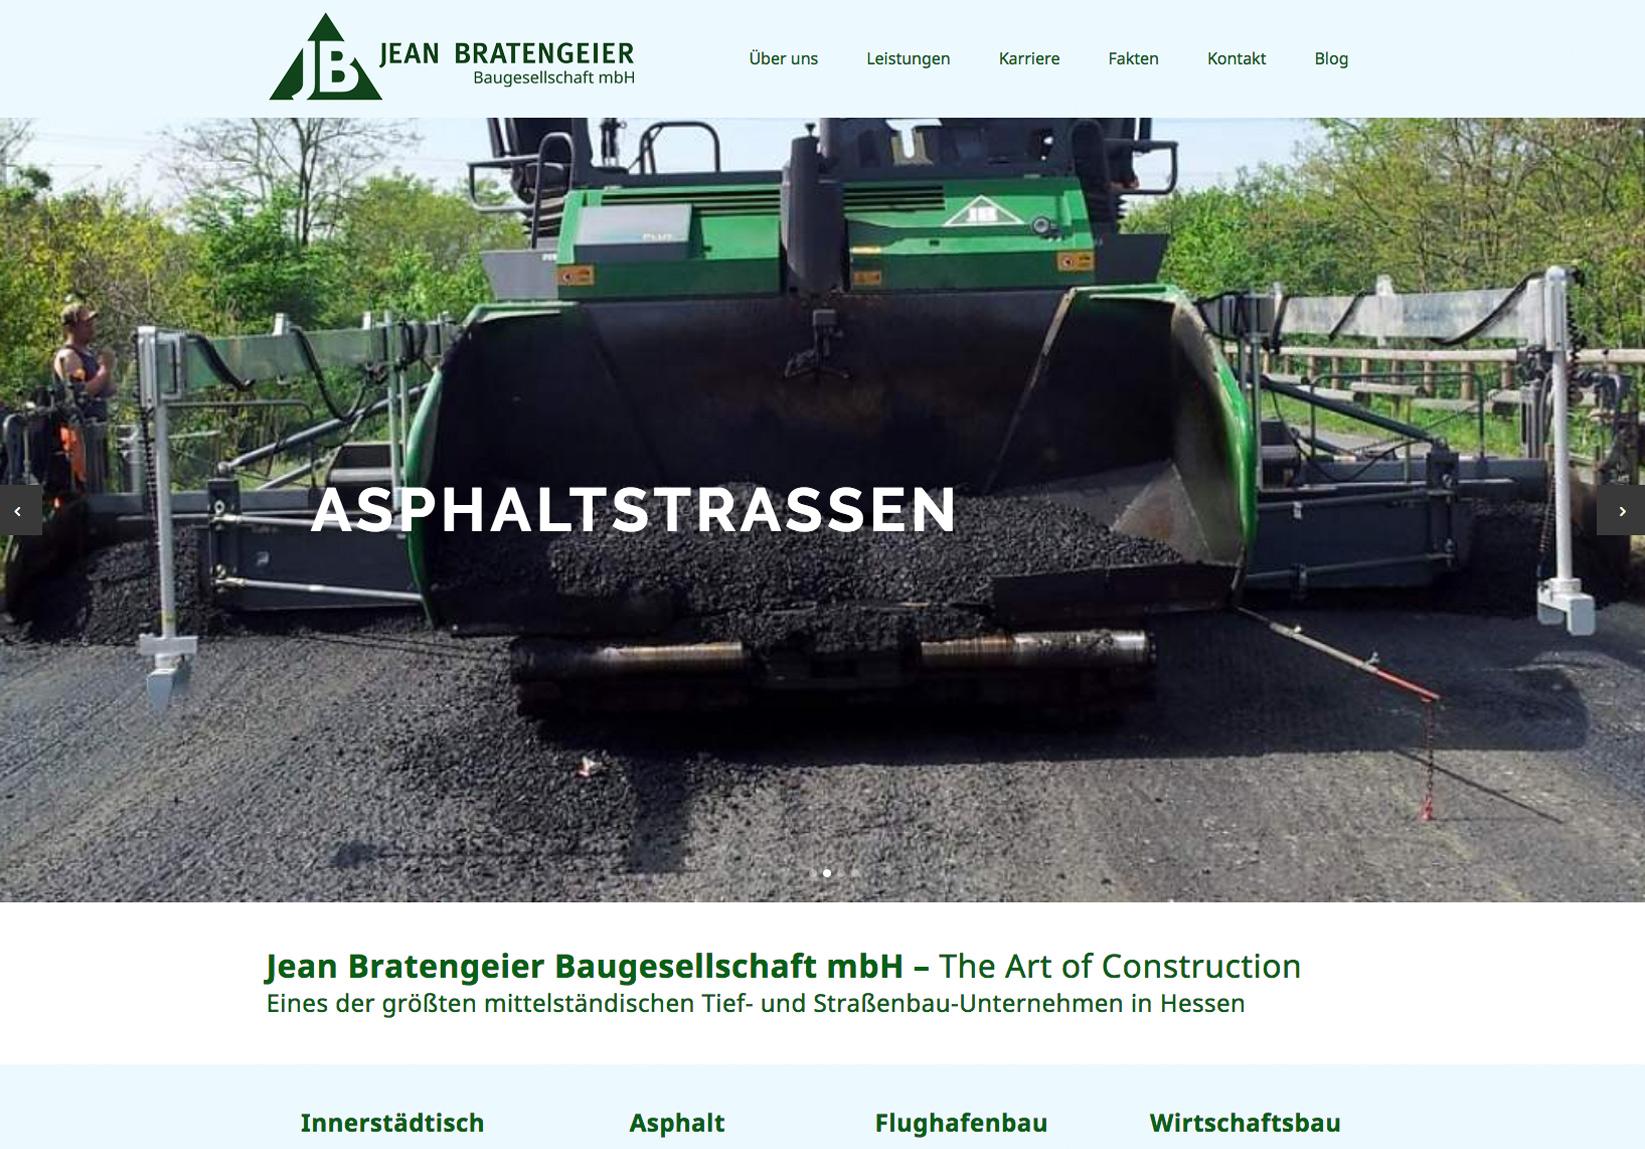 Bratengeier_bau